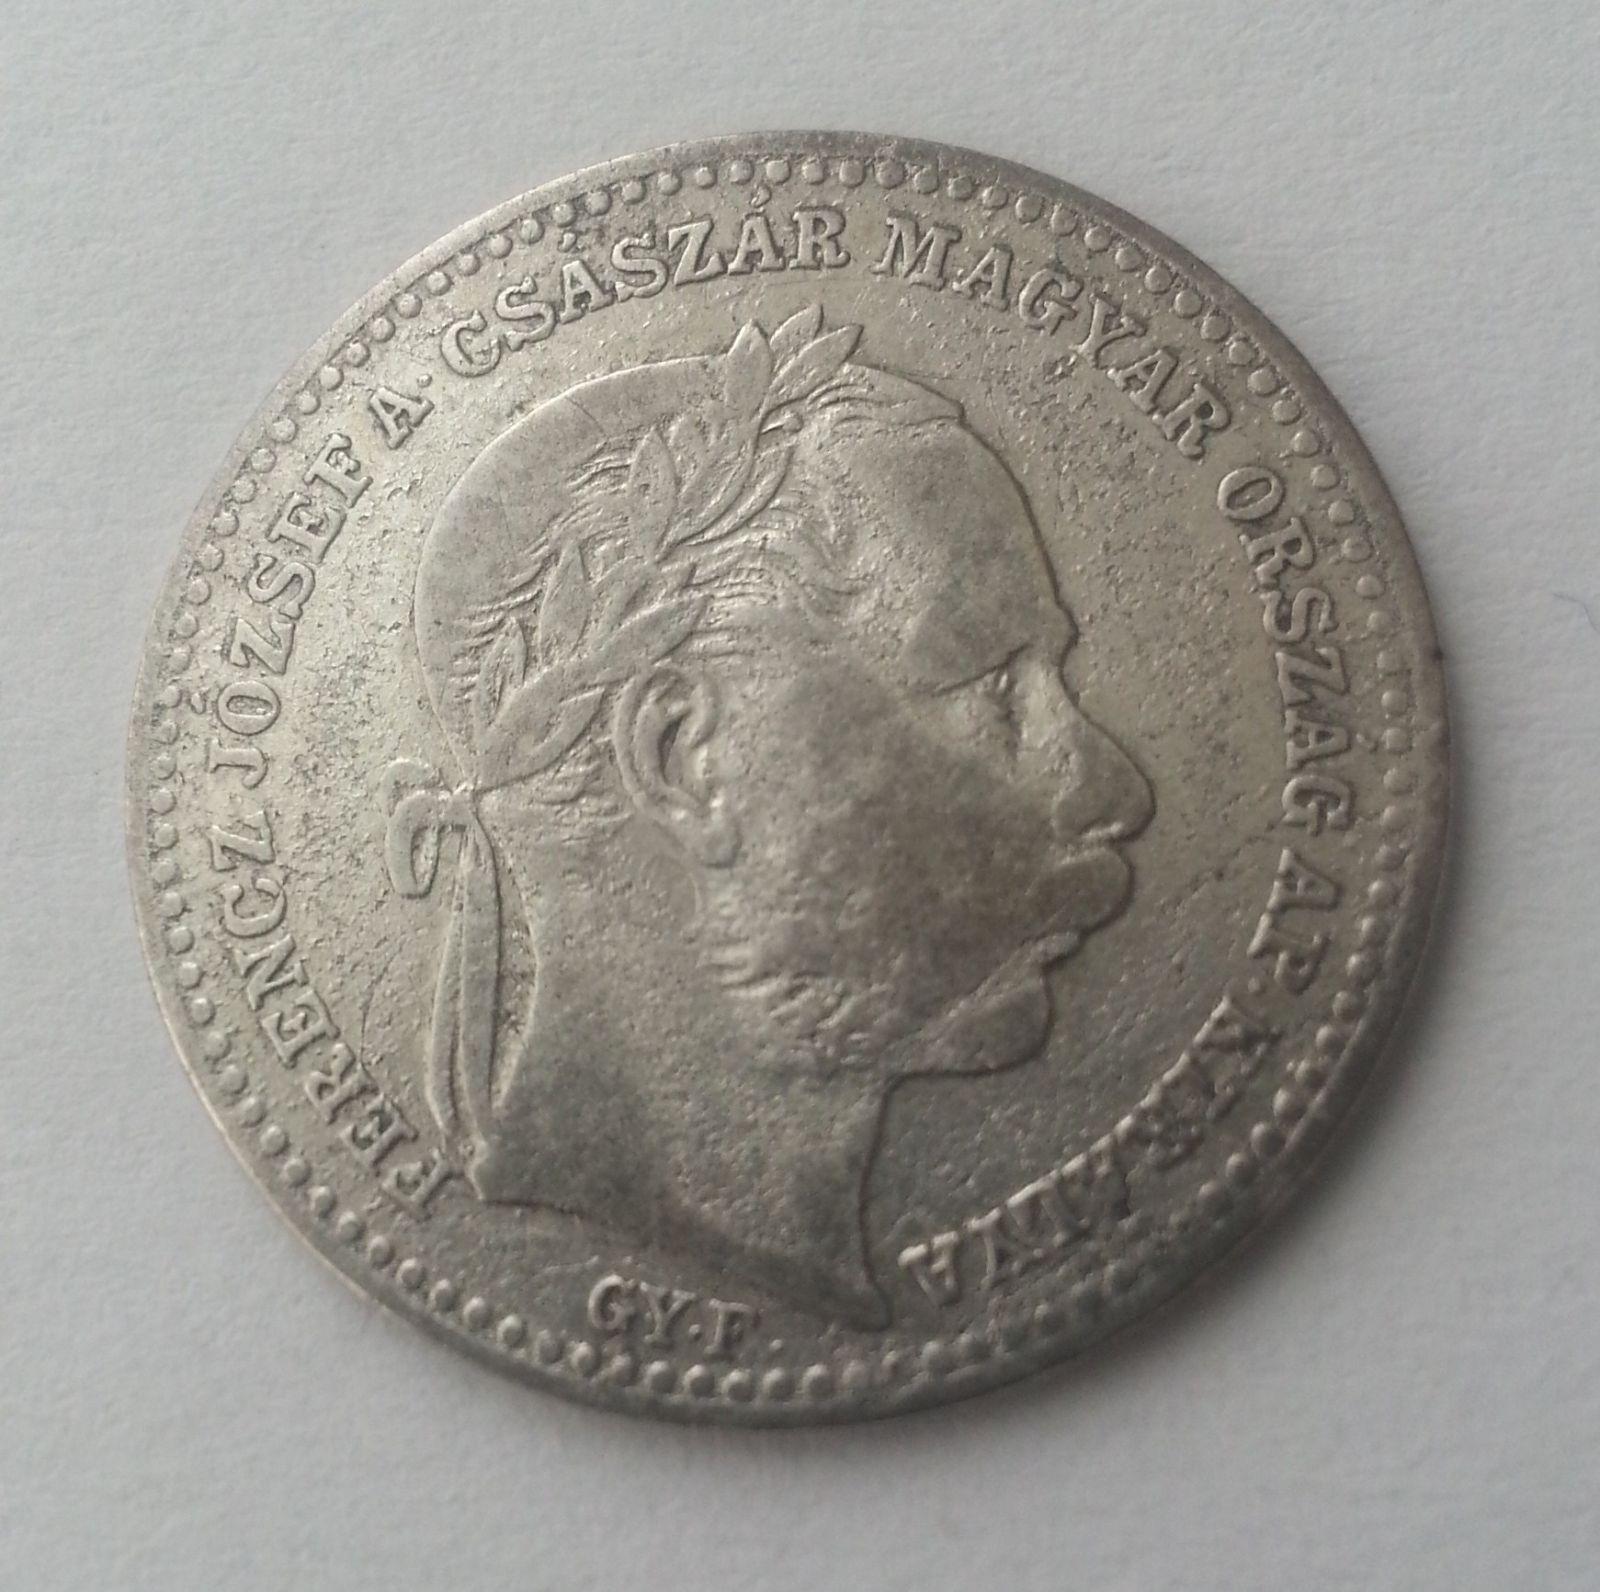 20 Krejcar, 1868, GYF, Uhry (opis Valto Penz)